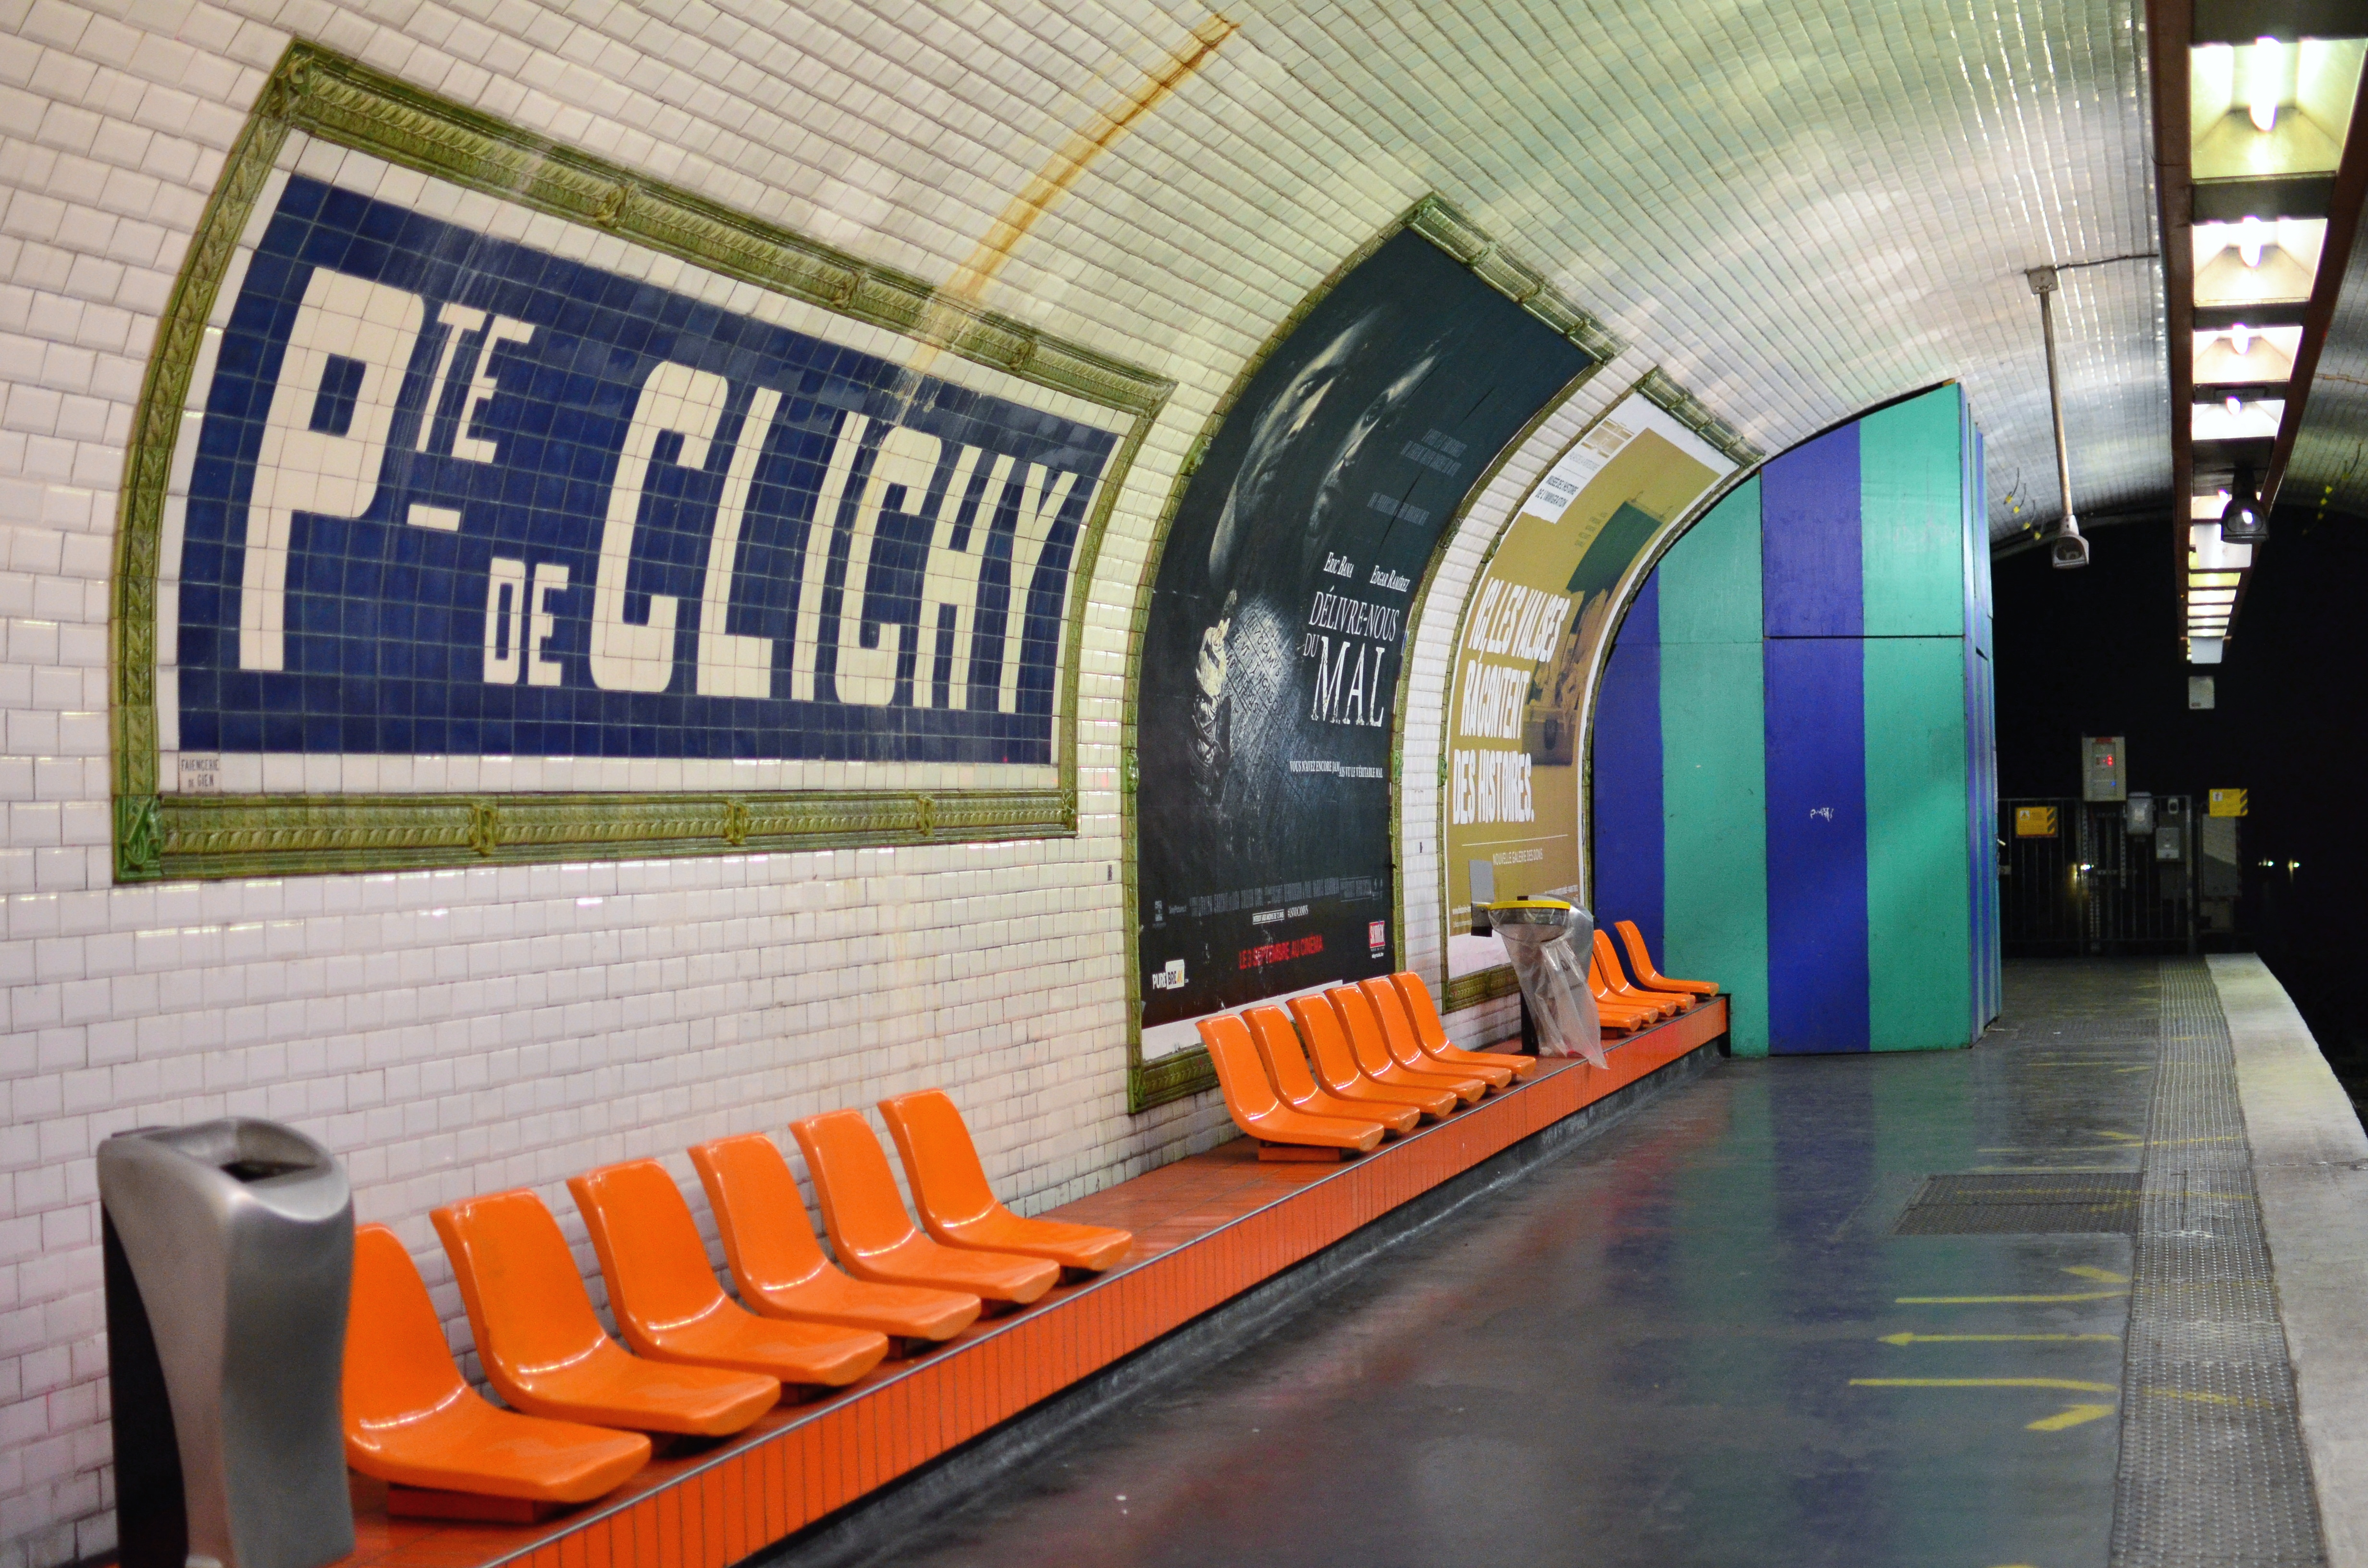 Porte de clichy metro porte de clichy metro station paris flickr photo sharing - Porte de clichy prostitutes ...